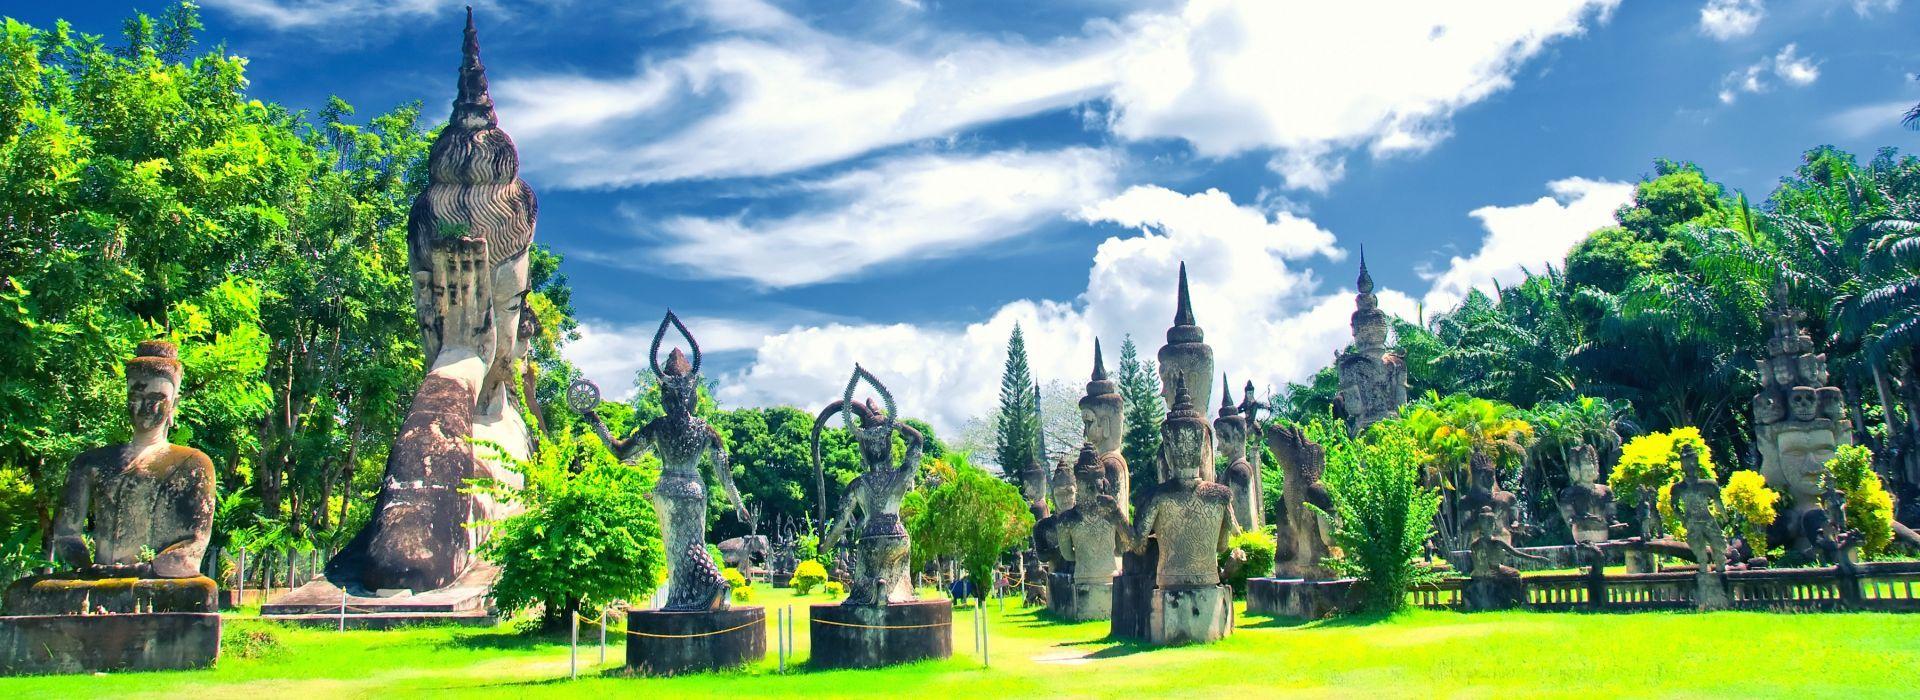 War sites Tours in Laos